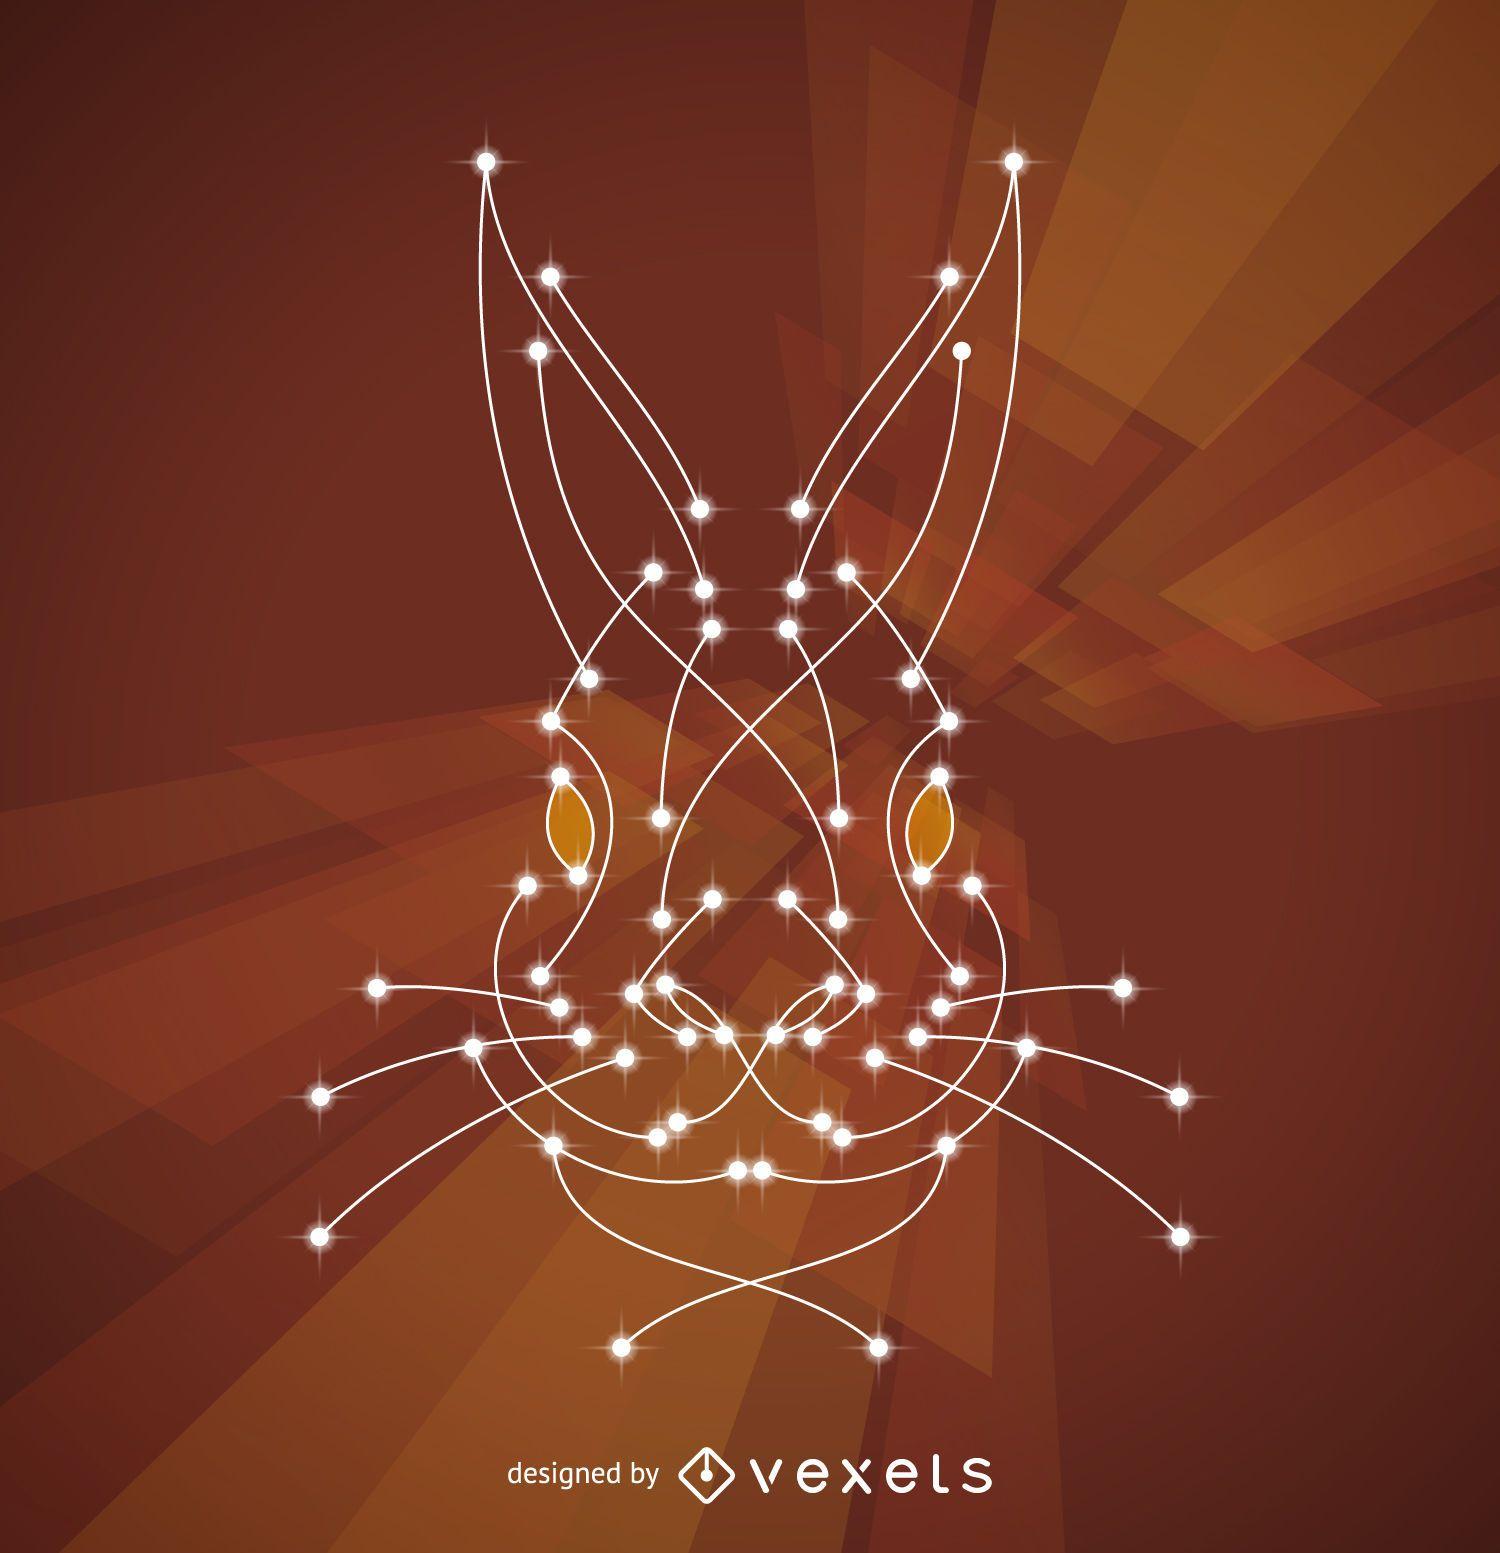 Rabbit illustration with nodes